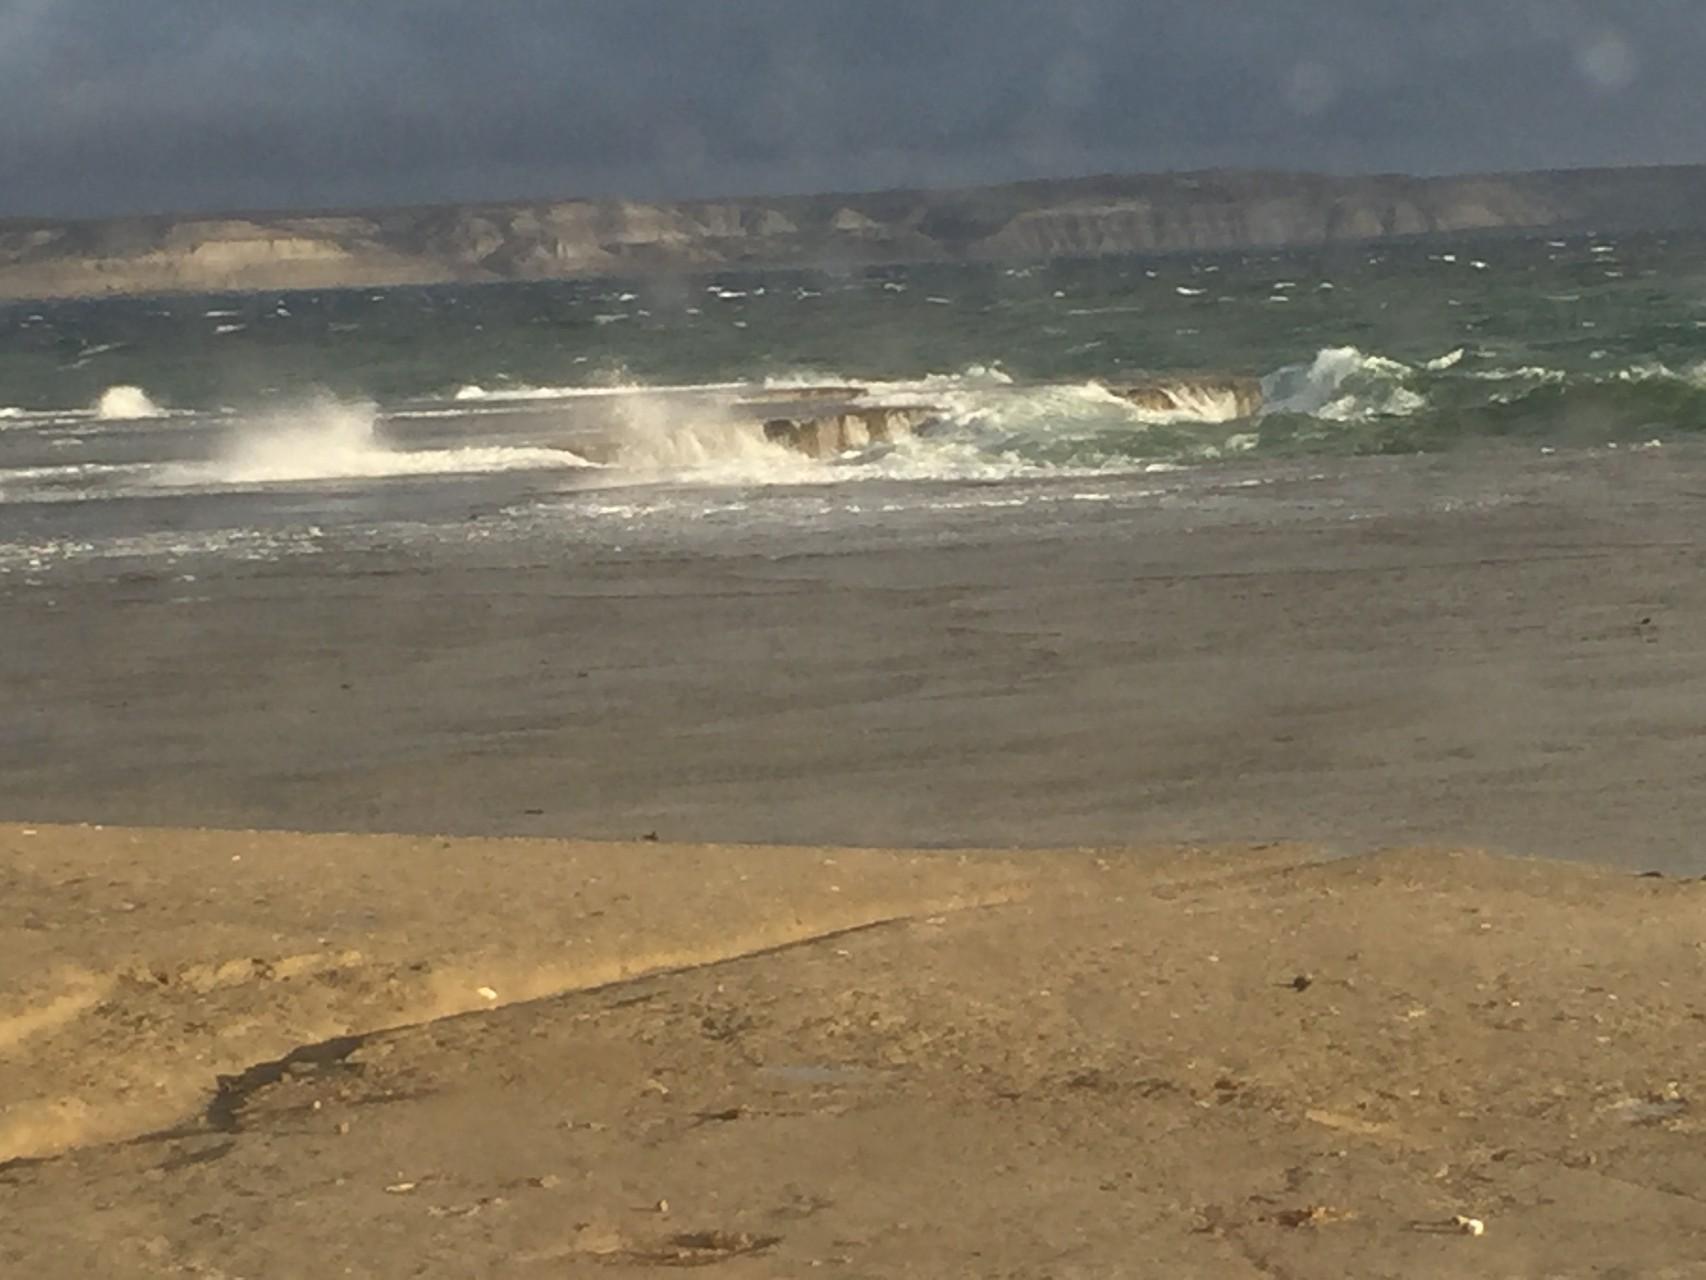 El Doradilla bei Sturm